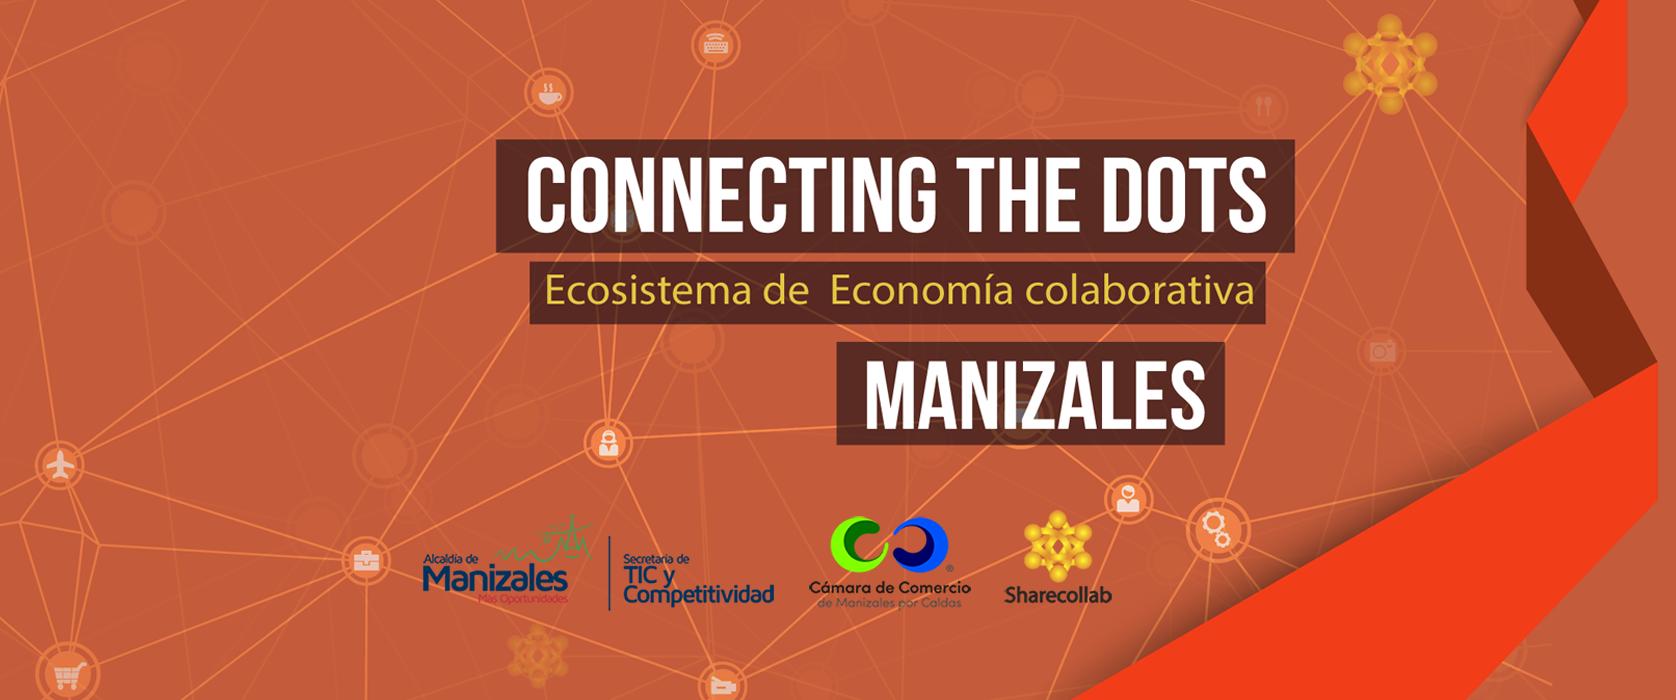 Ecosistema Economia Colaborativa – Manizales